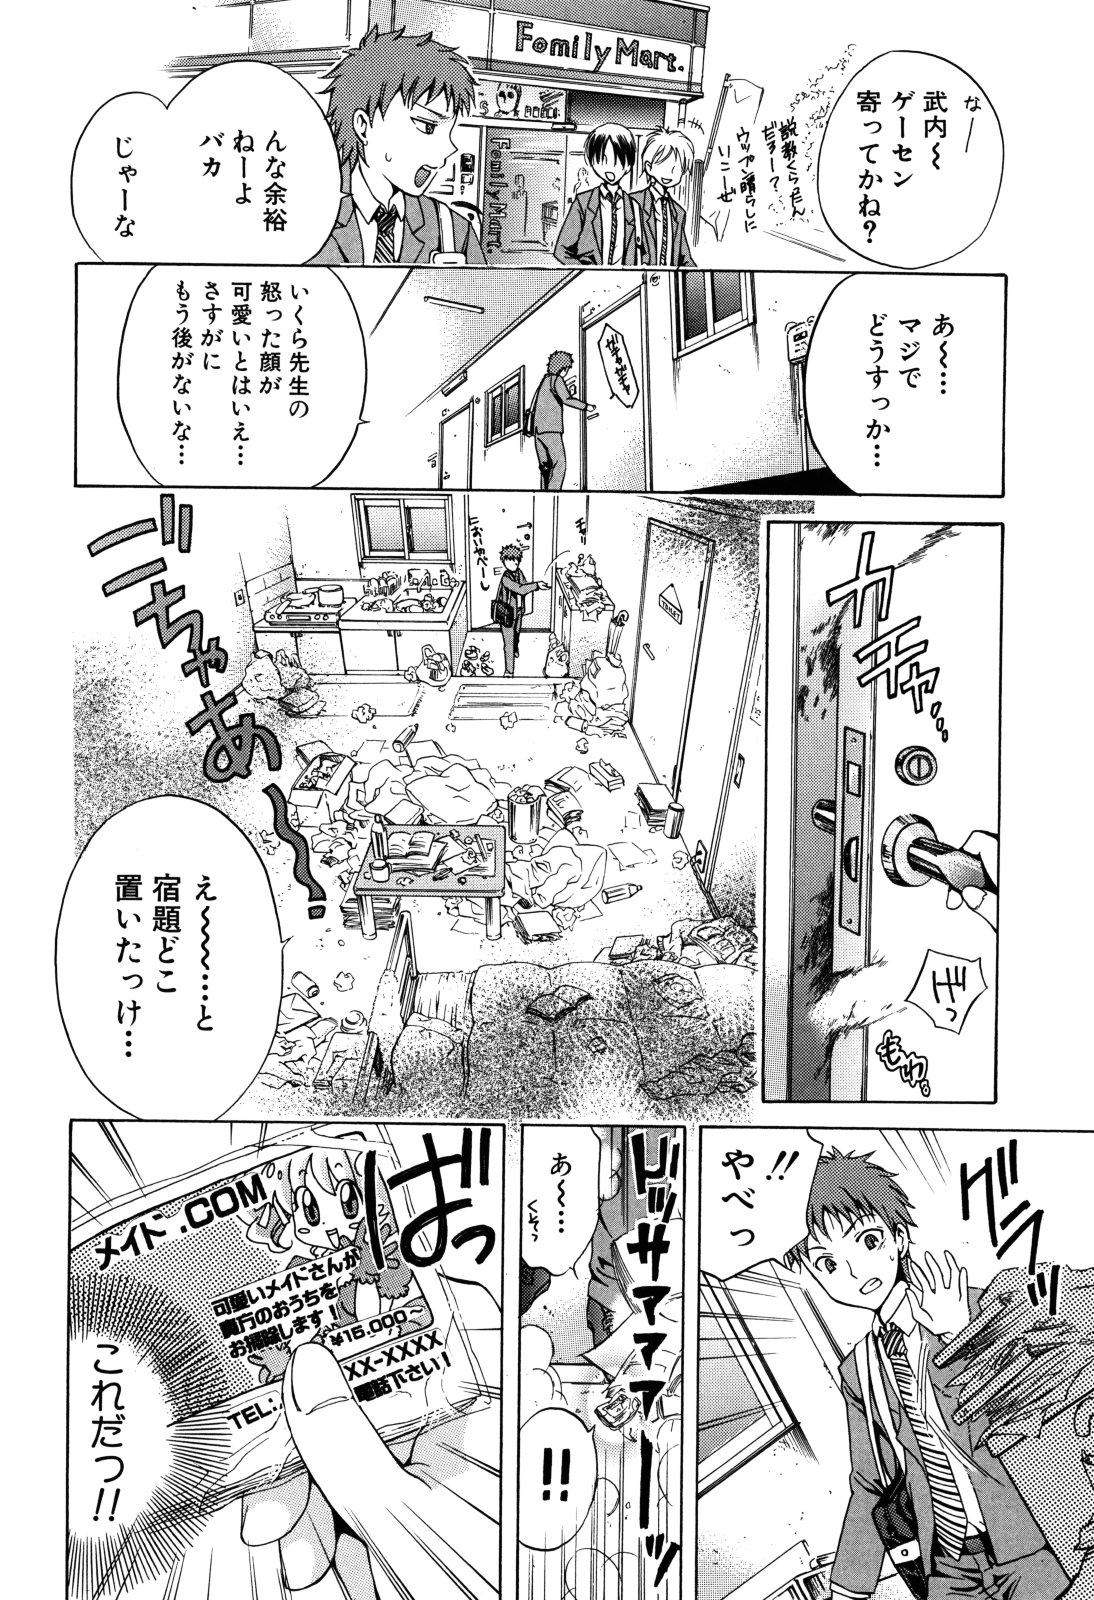 Kanojo ga Ochiru made - She in the depth 93